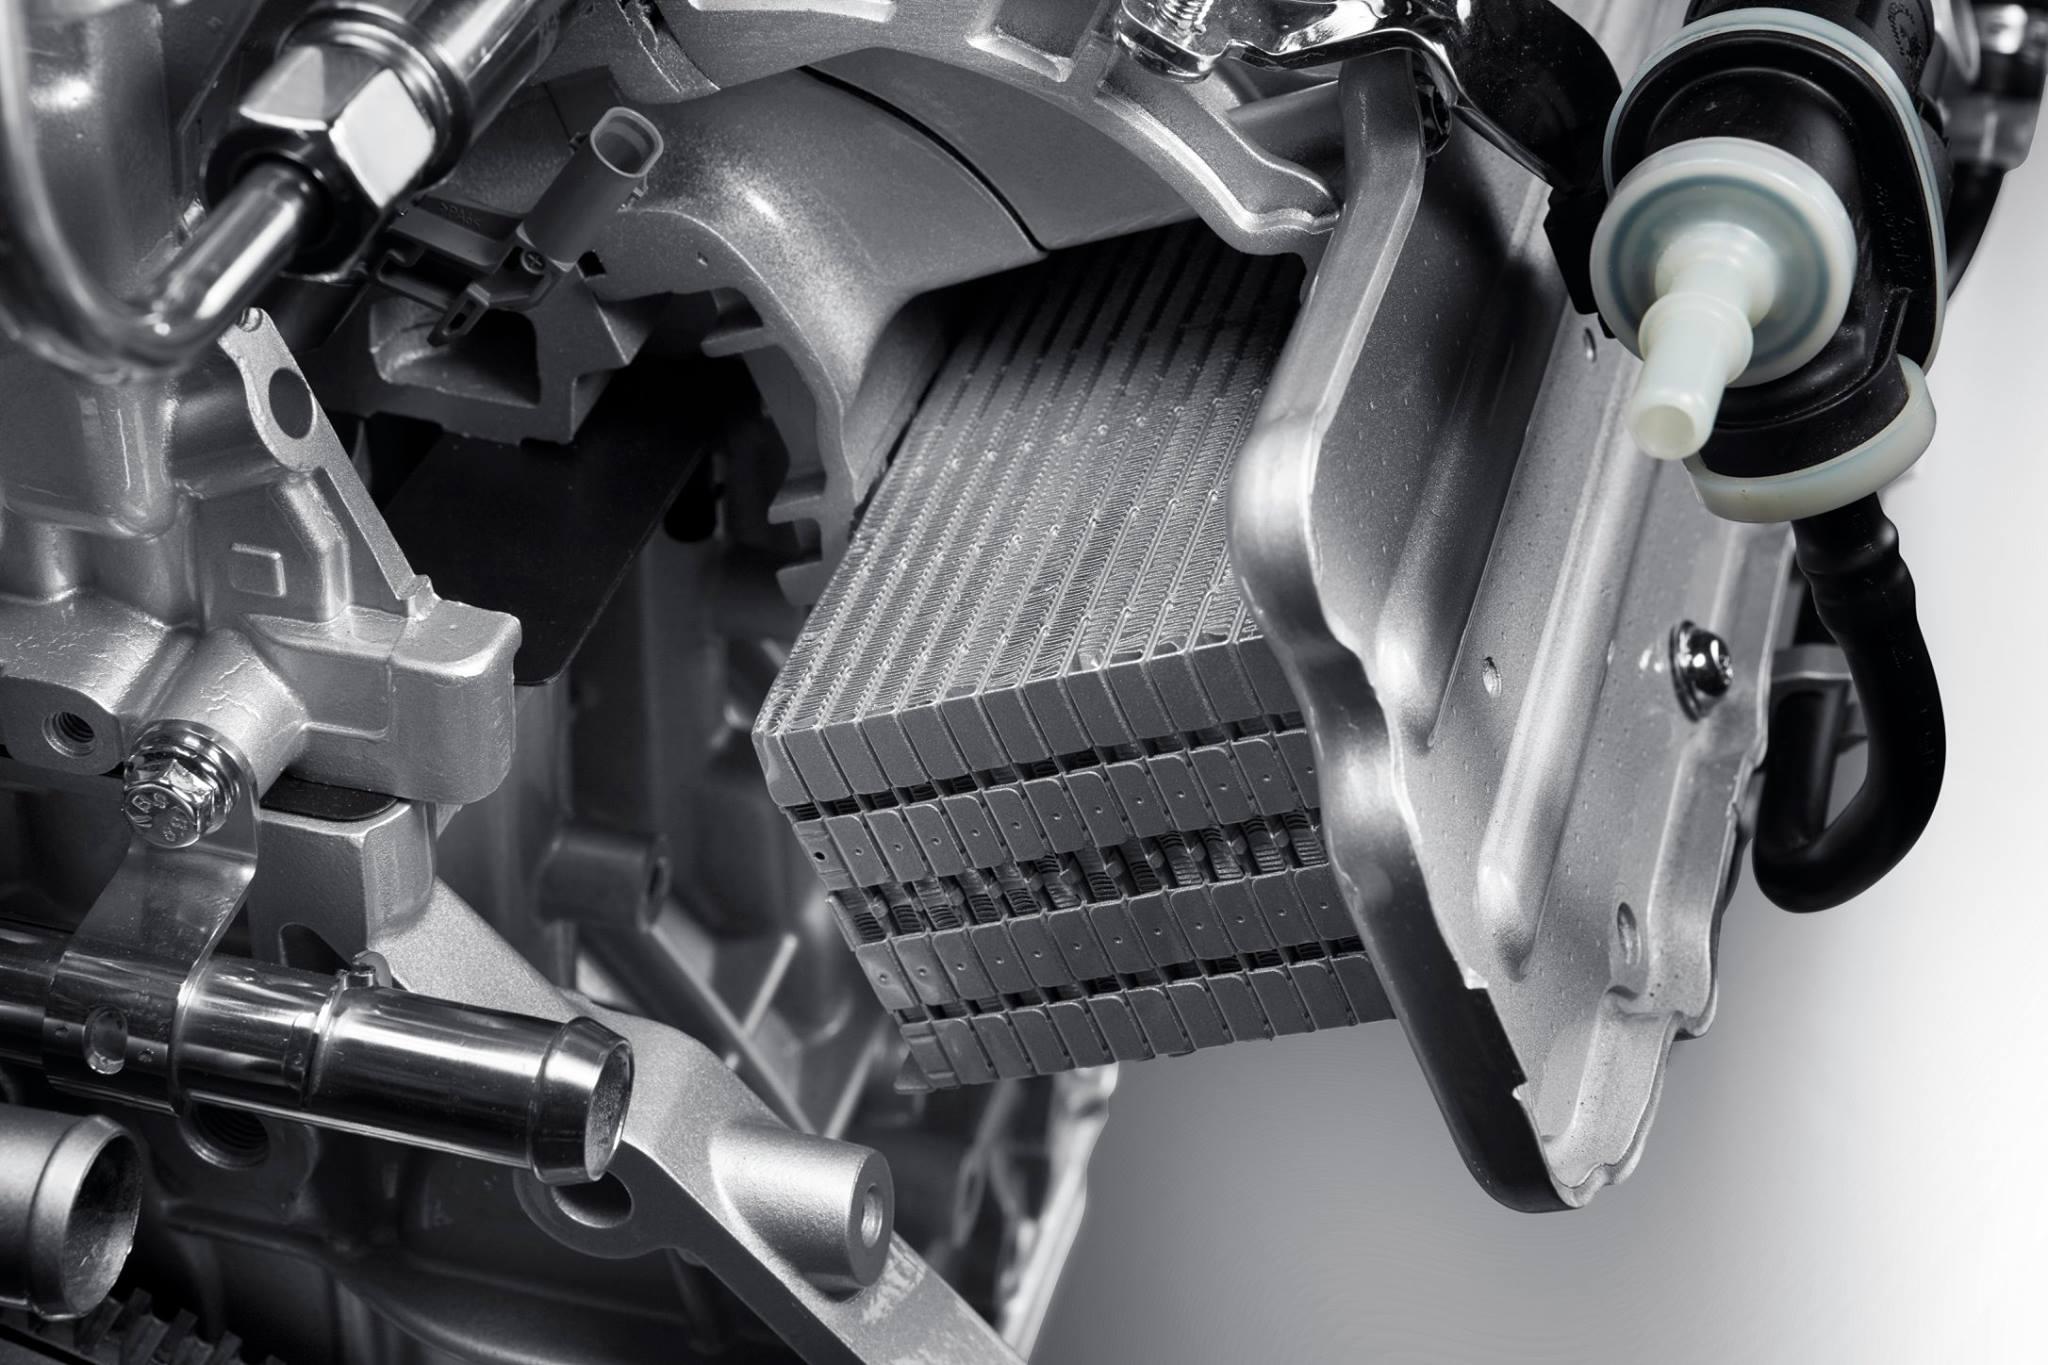 Motor-GSE-T3-1.0-Turbo INTERCOOLER